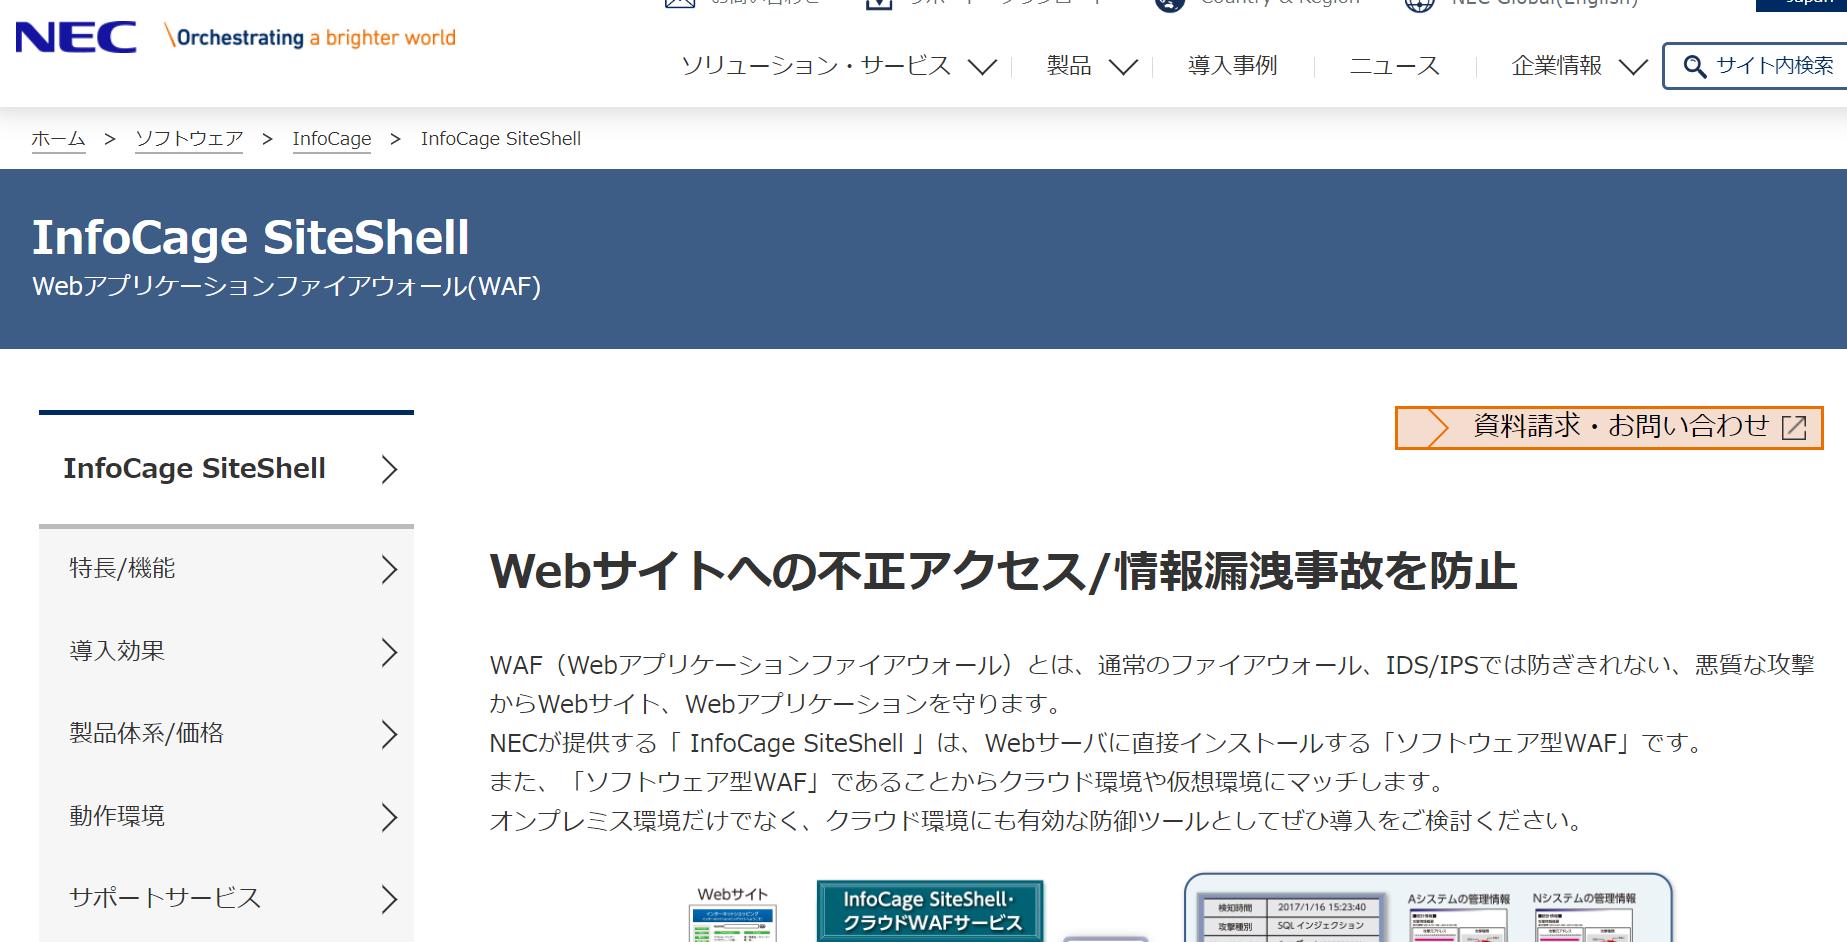 InfoCage SiteShell